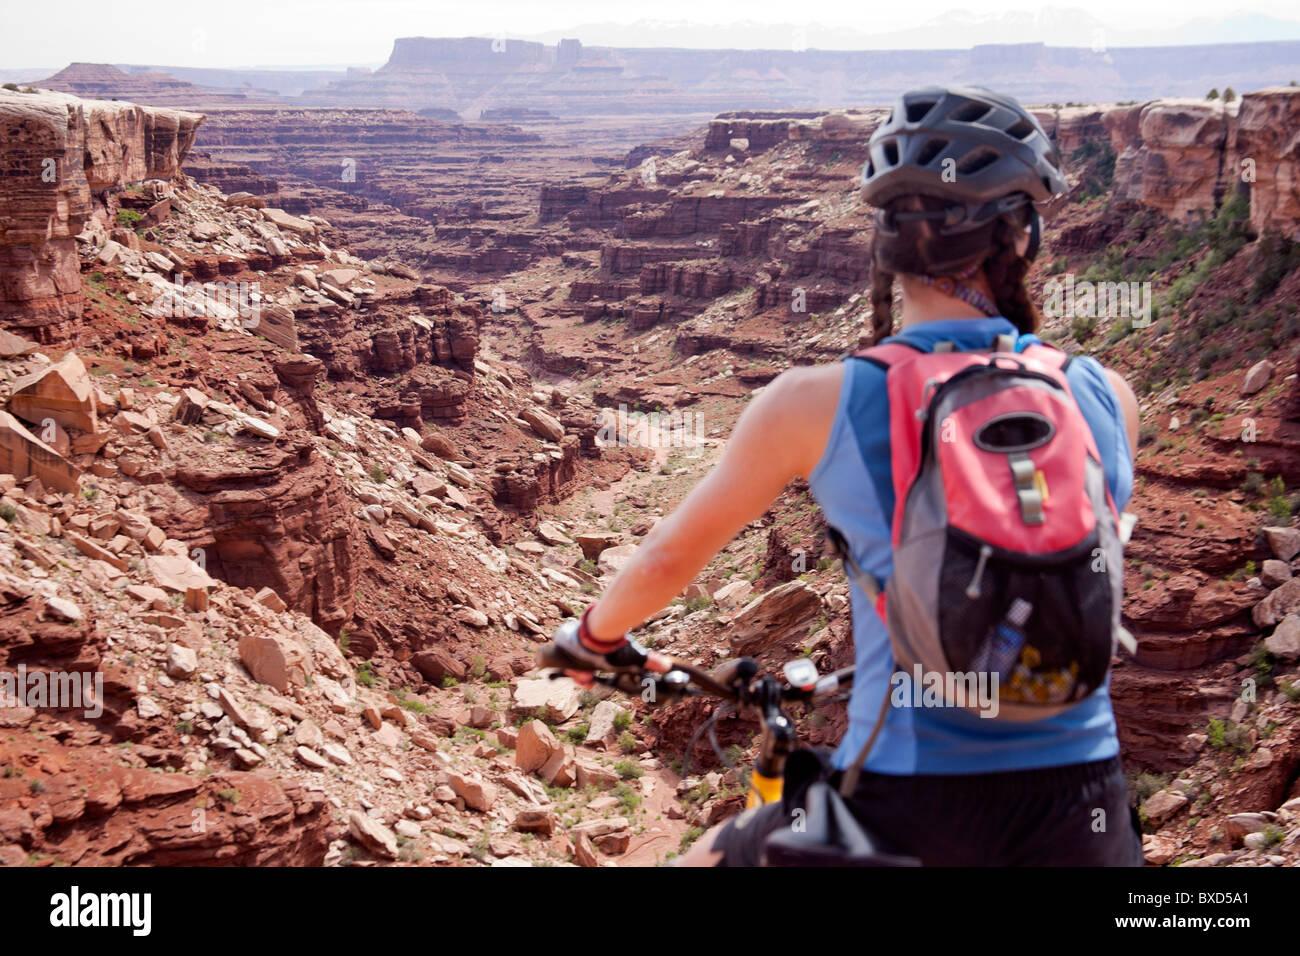 A woman bikes the White Rim trail in Utah. Stock Photo